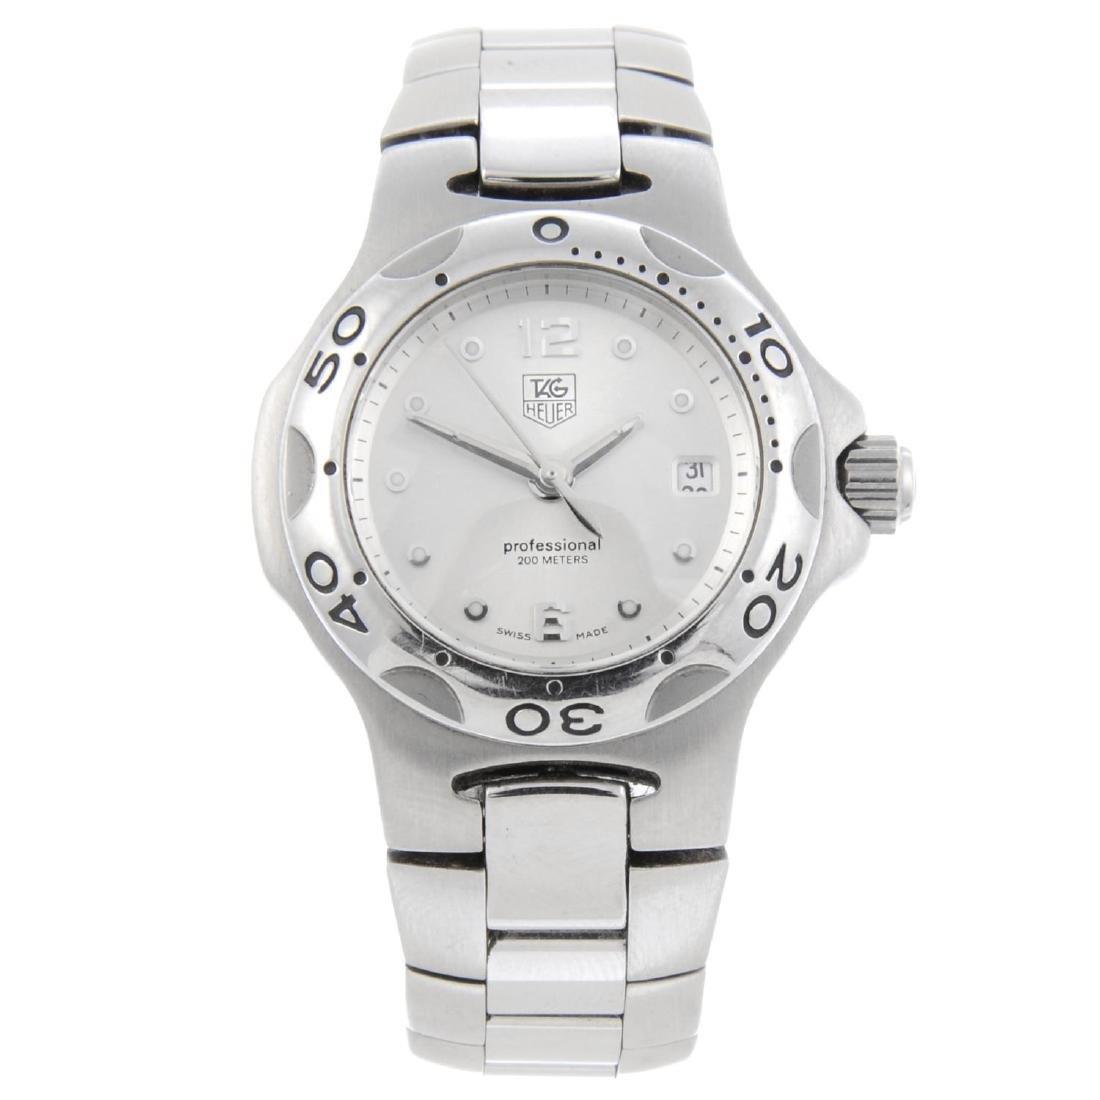 TAG HEUER - a lady's Kirium bracelet watch. Stainless